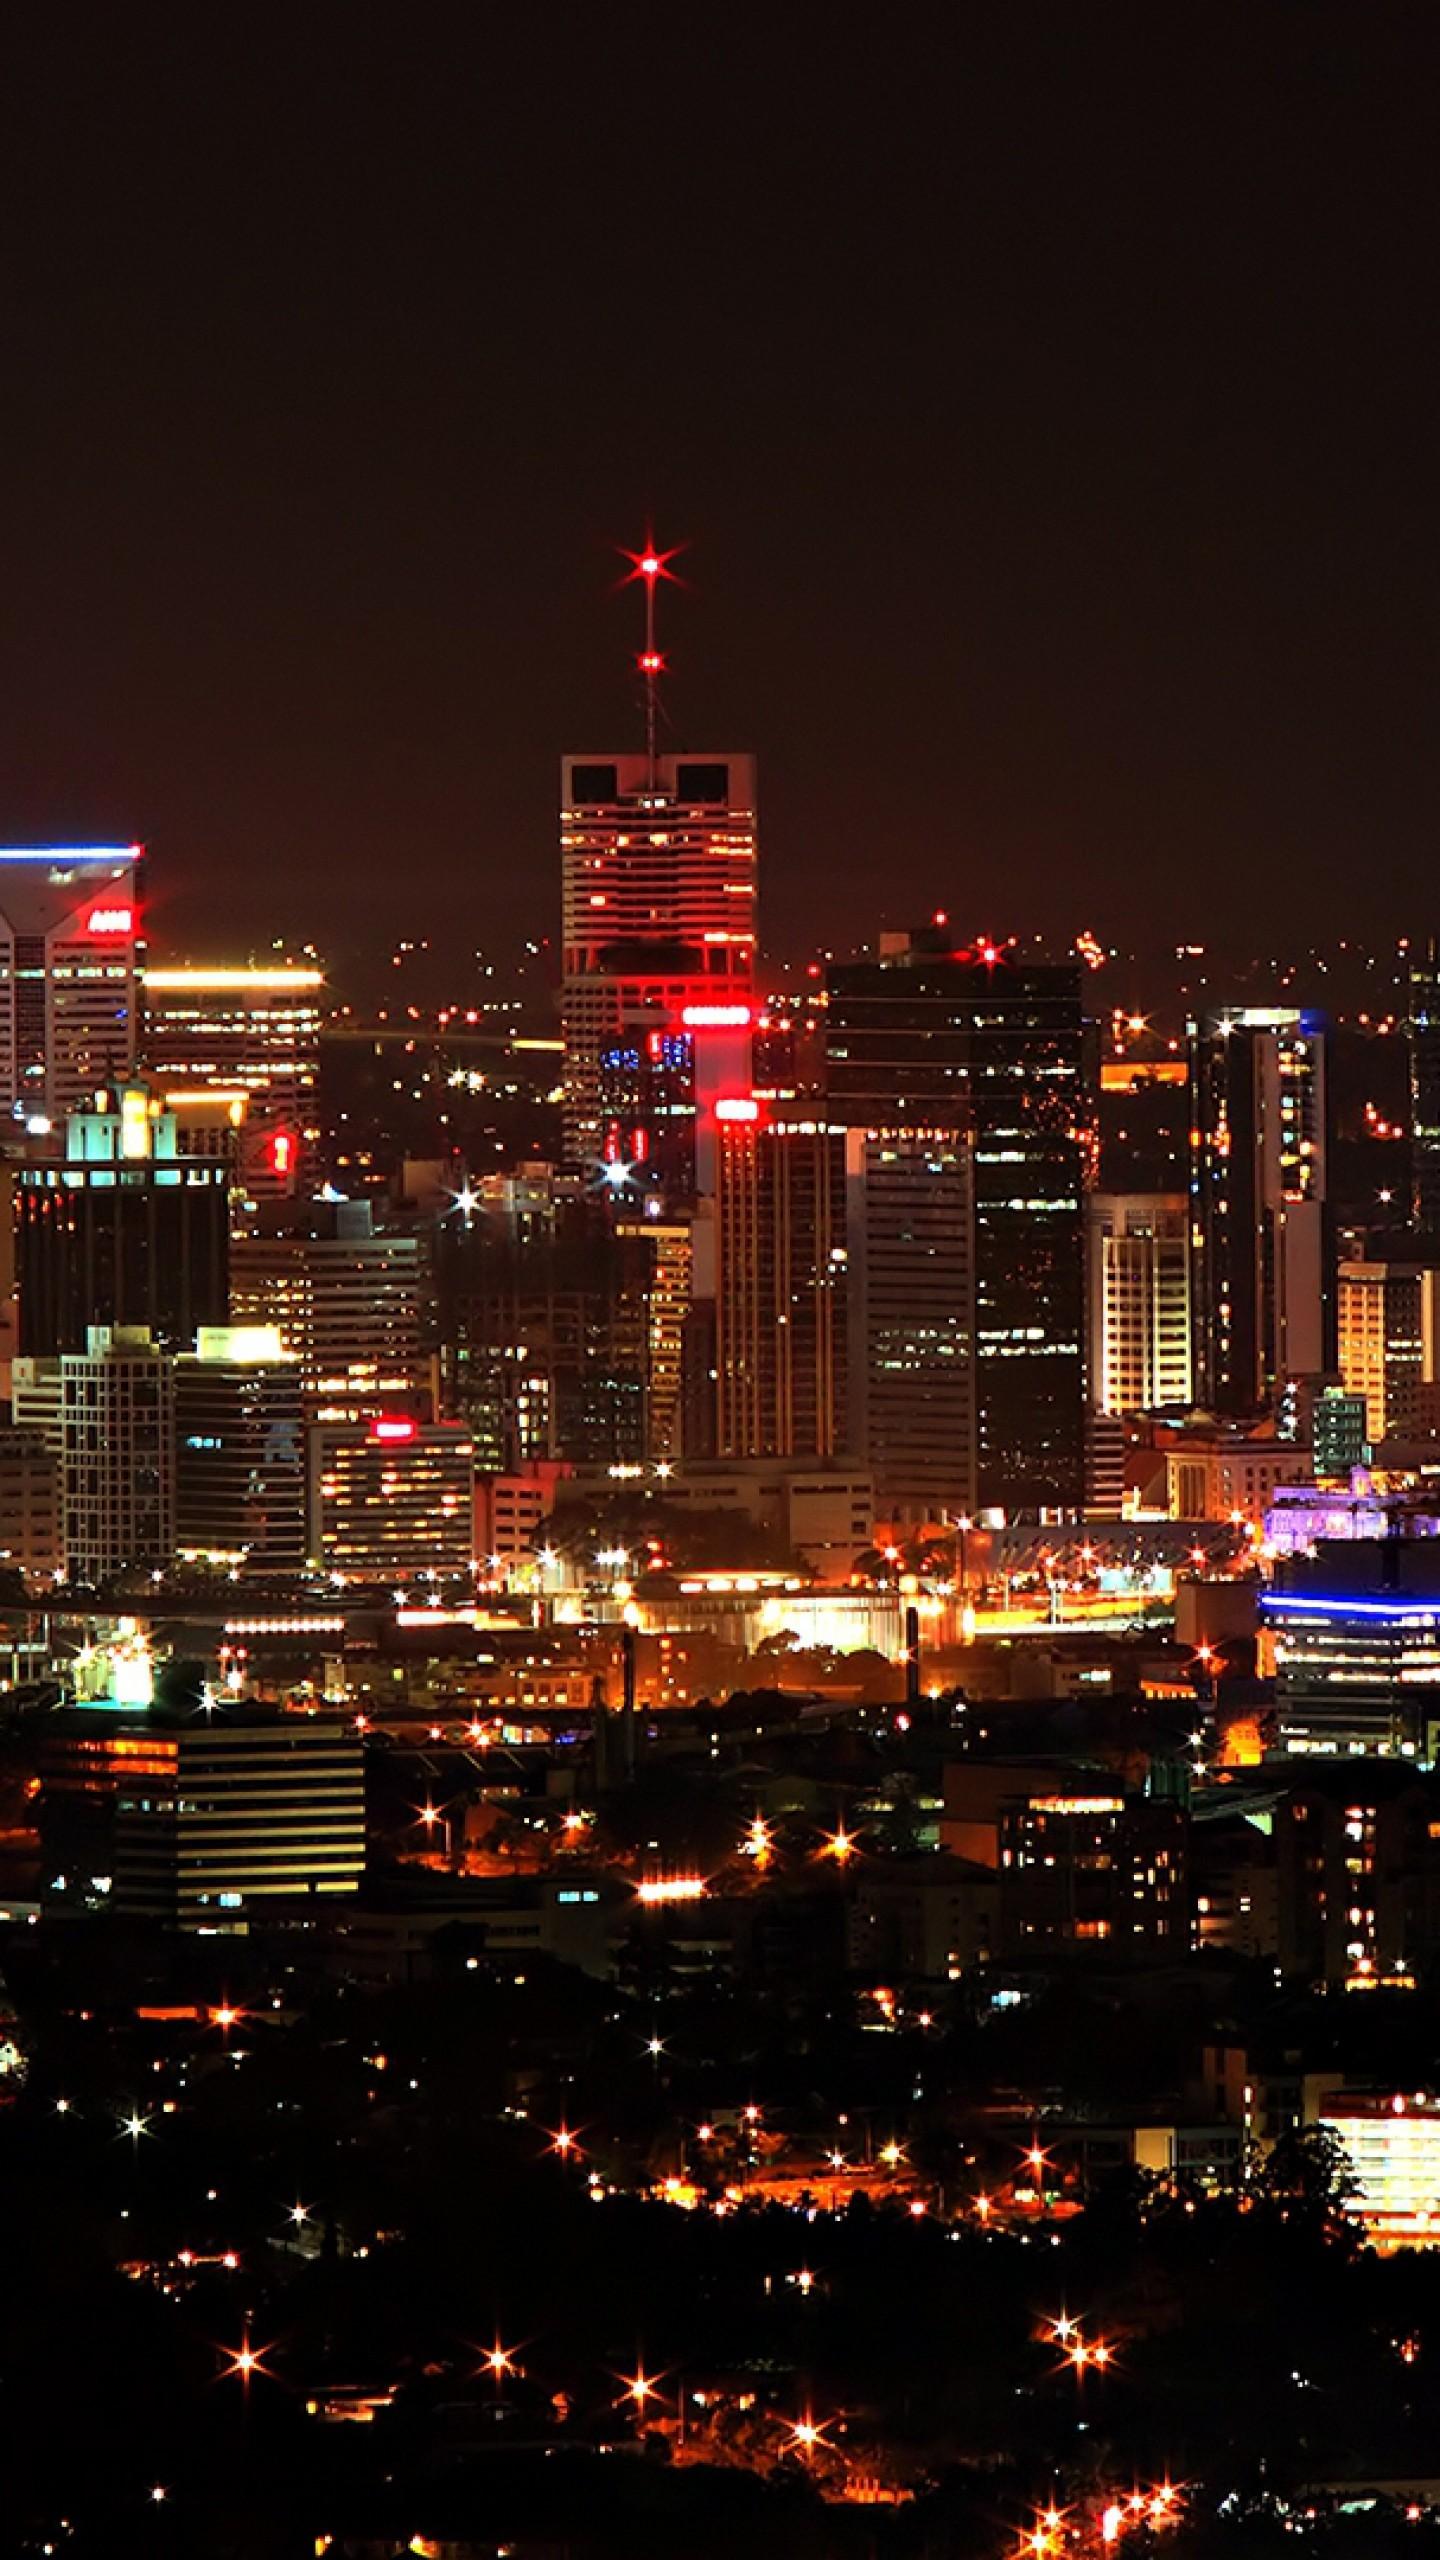 City lights background wallpaper 61 images - Night light city wallpaper ...